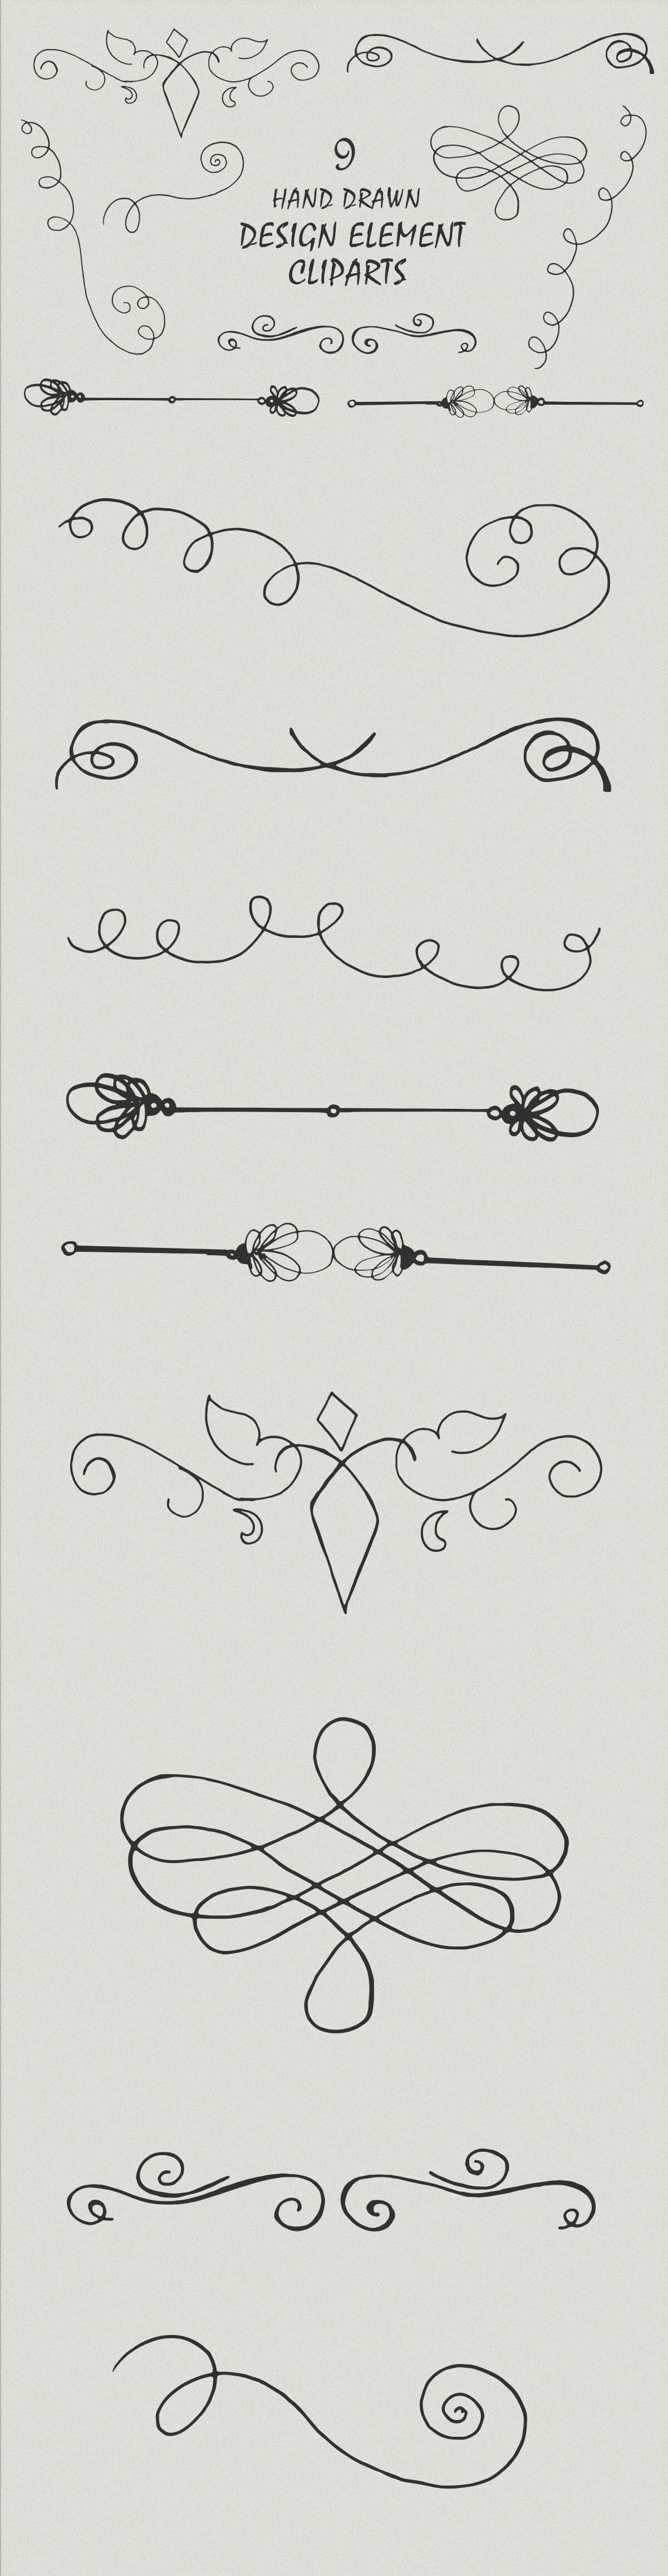 Free Handmade Design Element Cliparts